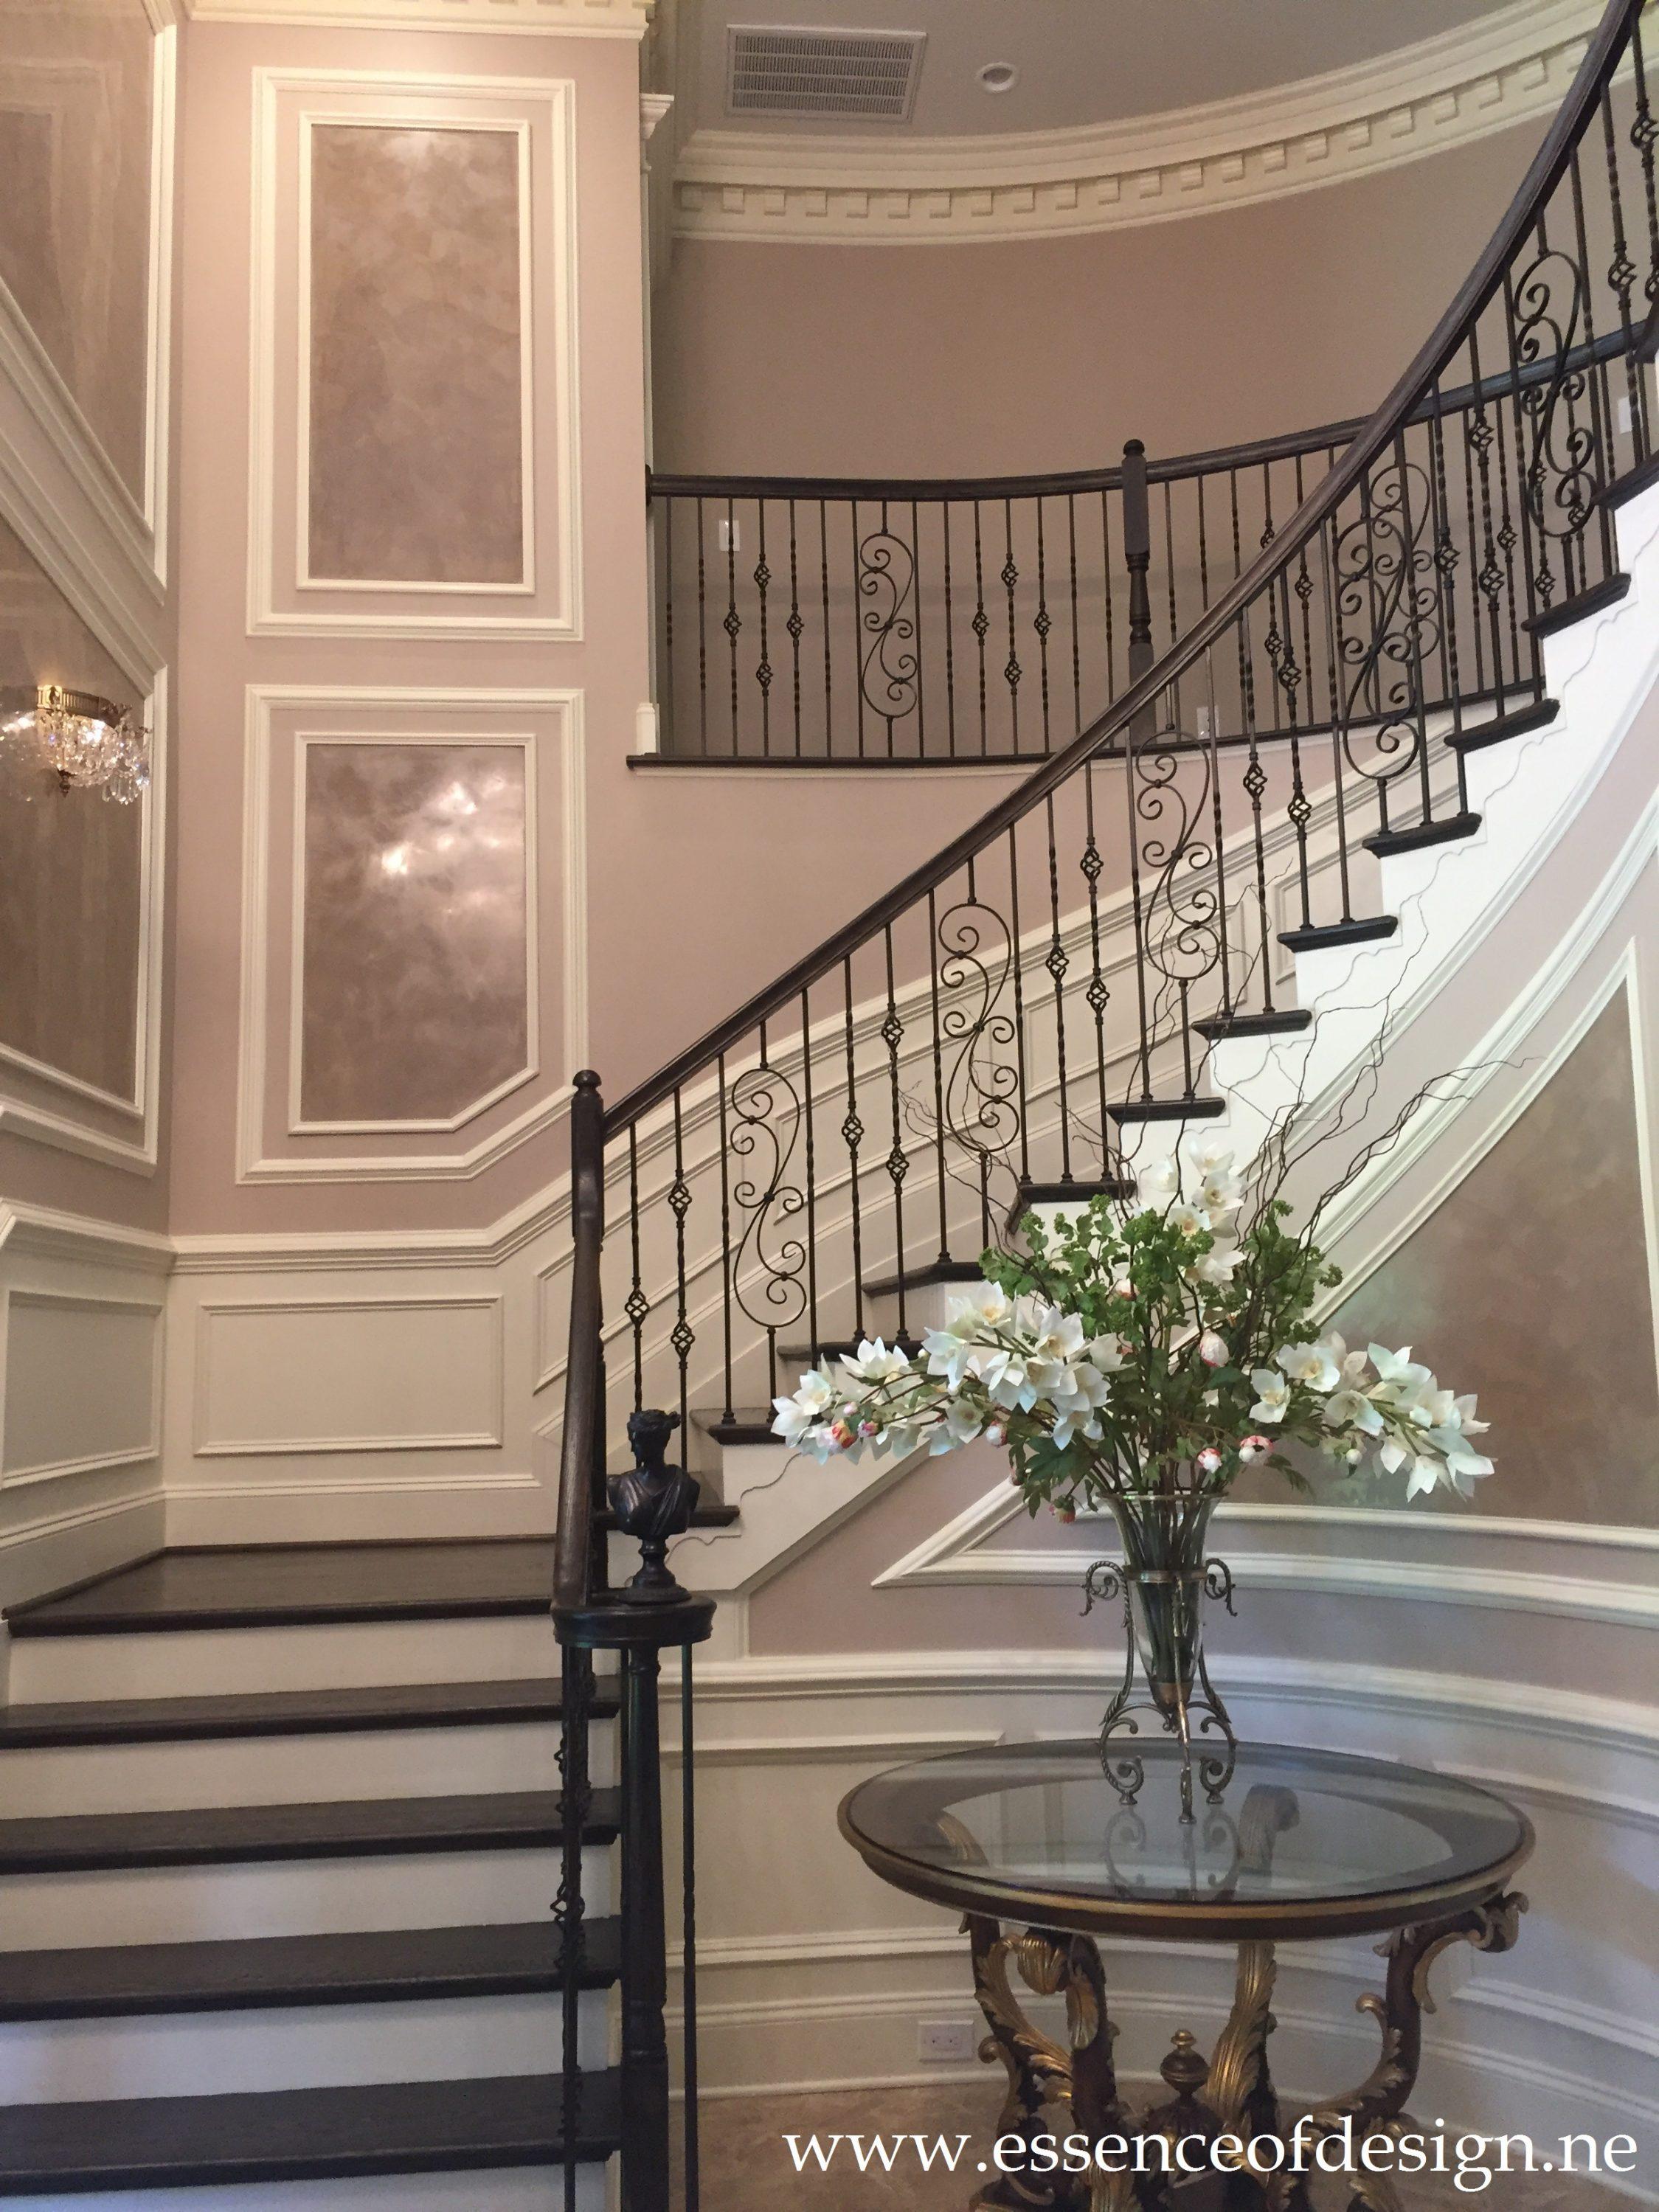 Potomac-MD-Interior-Designer-Shiva-Rostami-Foyer-Faux-finish-millwork